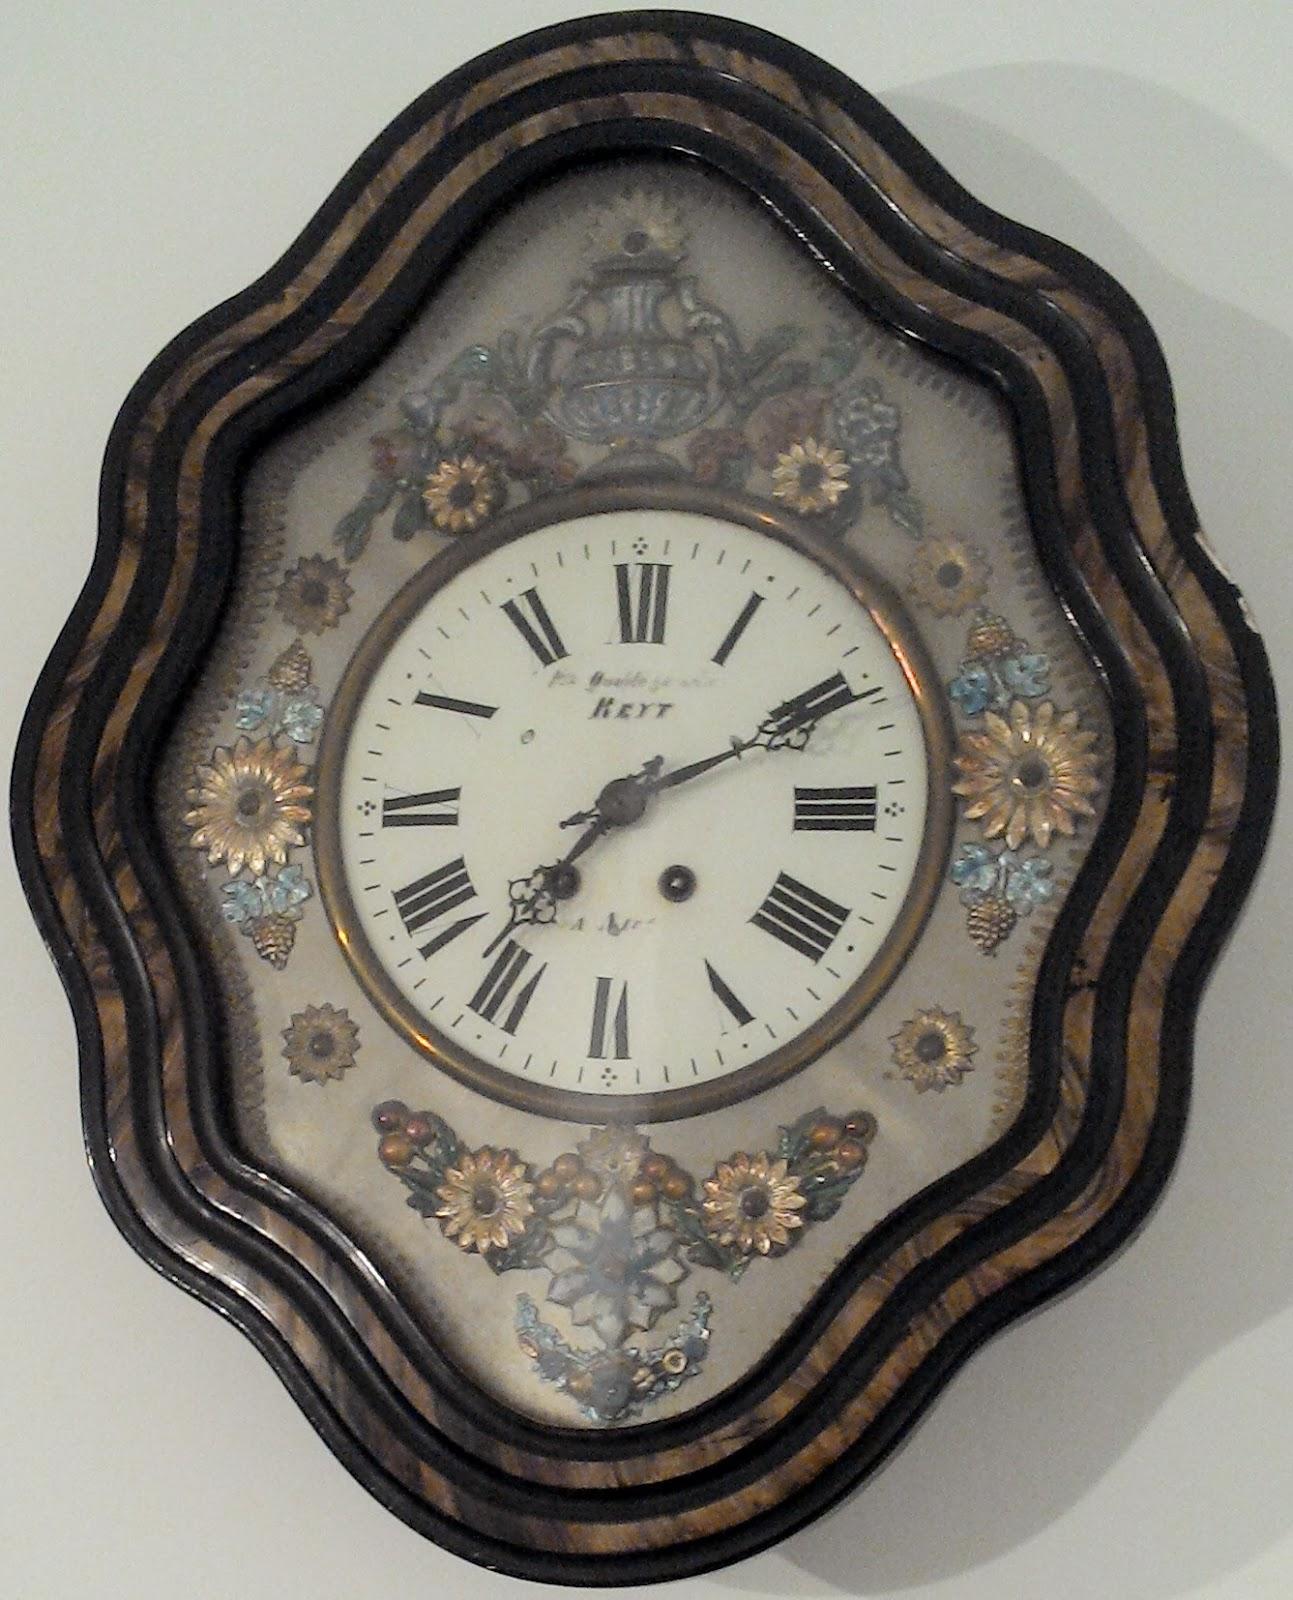 oeil de boeuf pendule ancienne french clock paris cadran. Black Bedroom Furniture Sets. Home Design Ideas